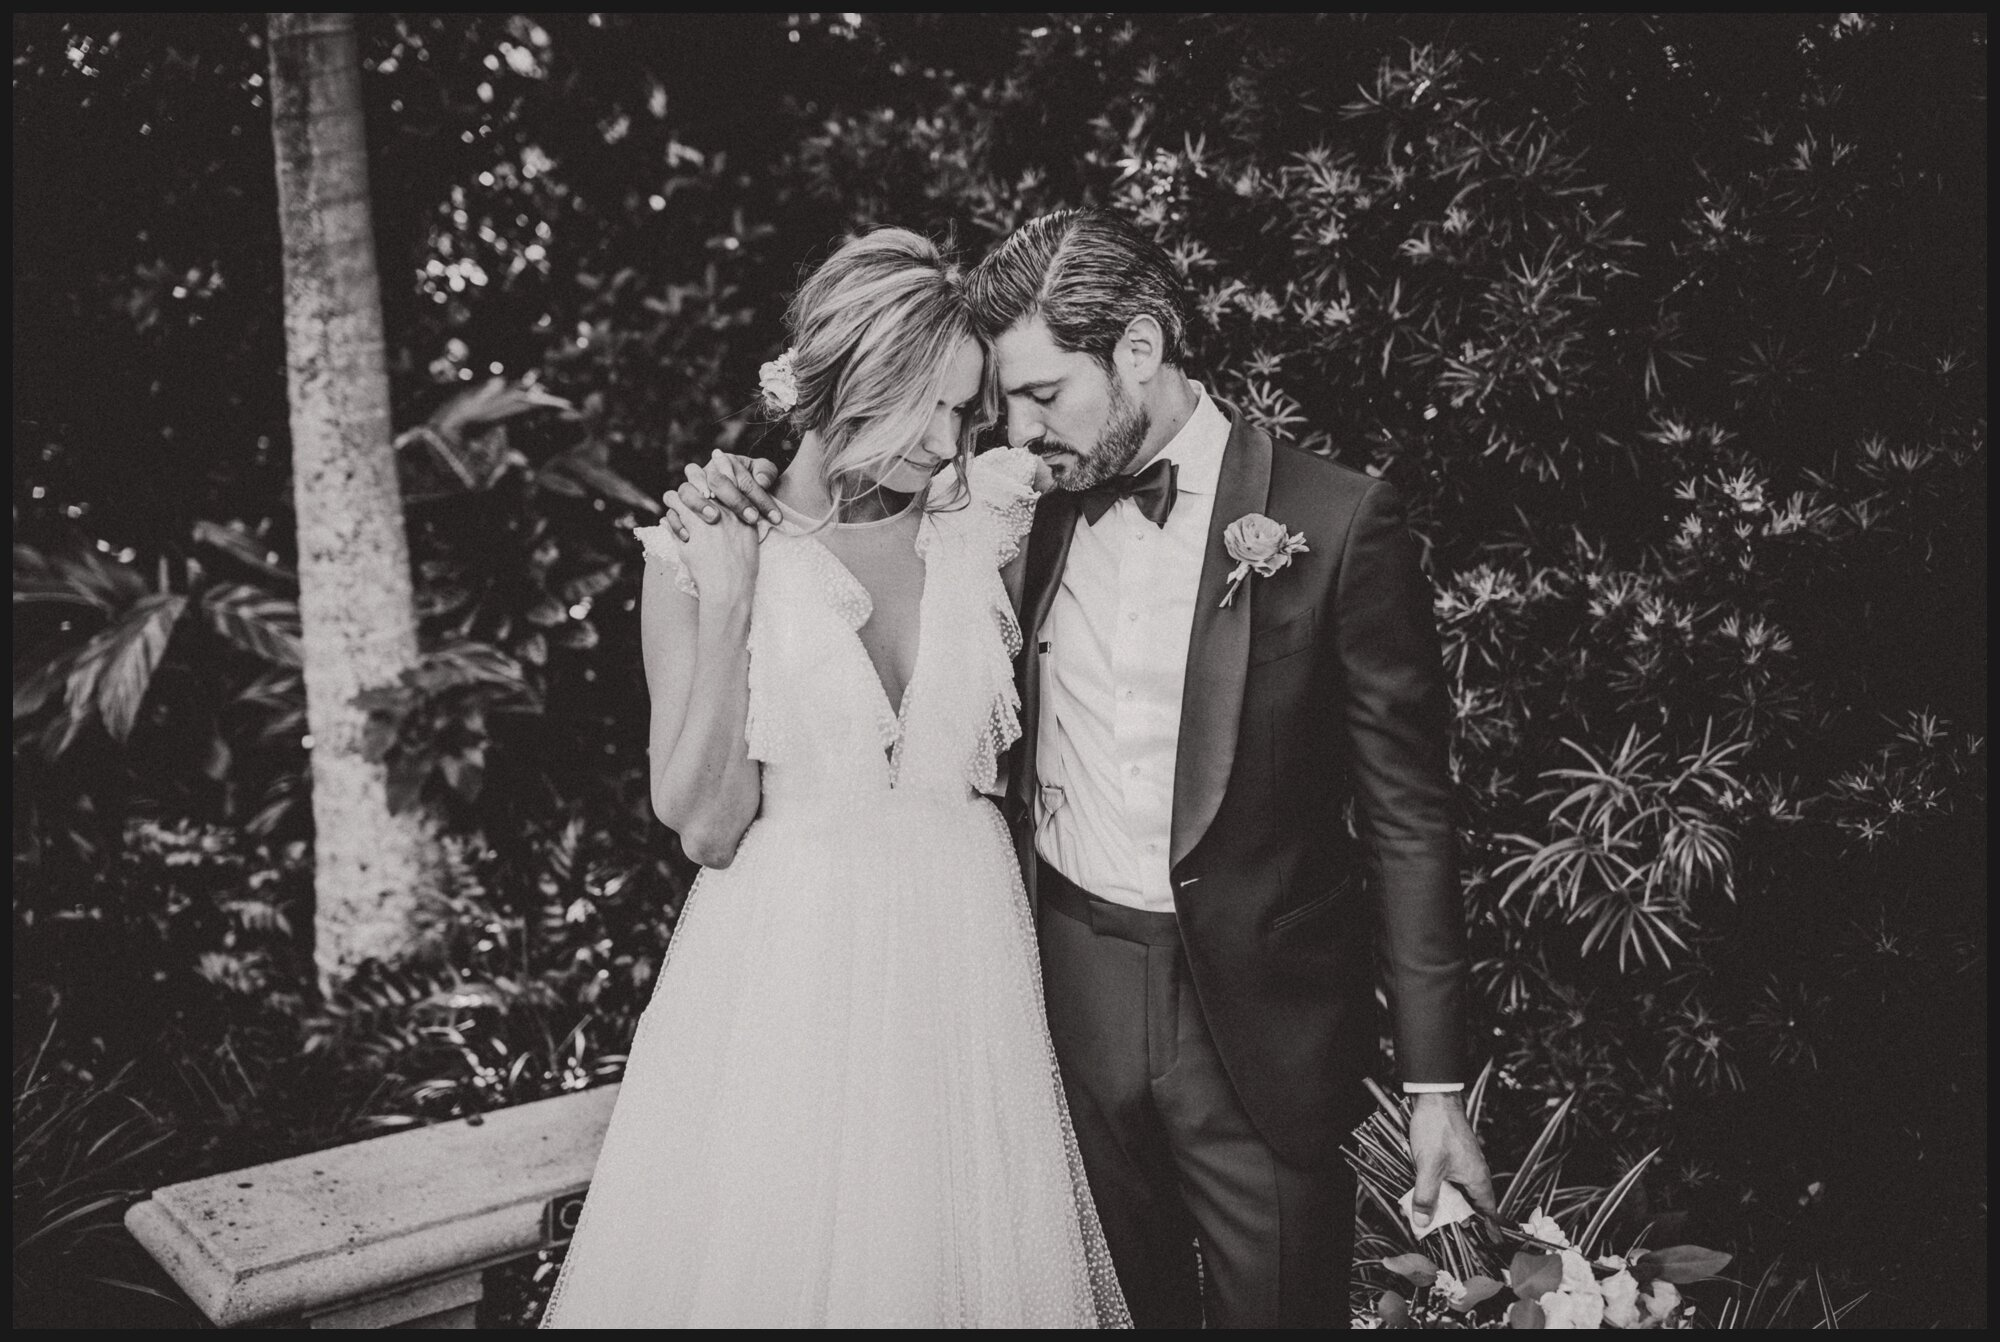 Orlando-Wedding-Photographer-destination-wedding-photographer-florida-wedding-photographer-hawaii-wedding-photographer_0743.jpg